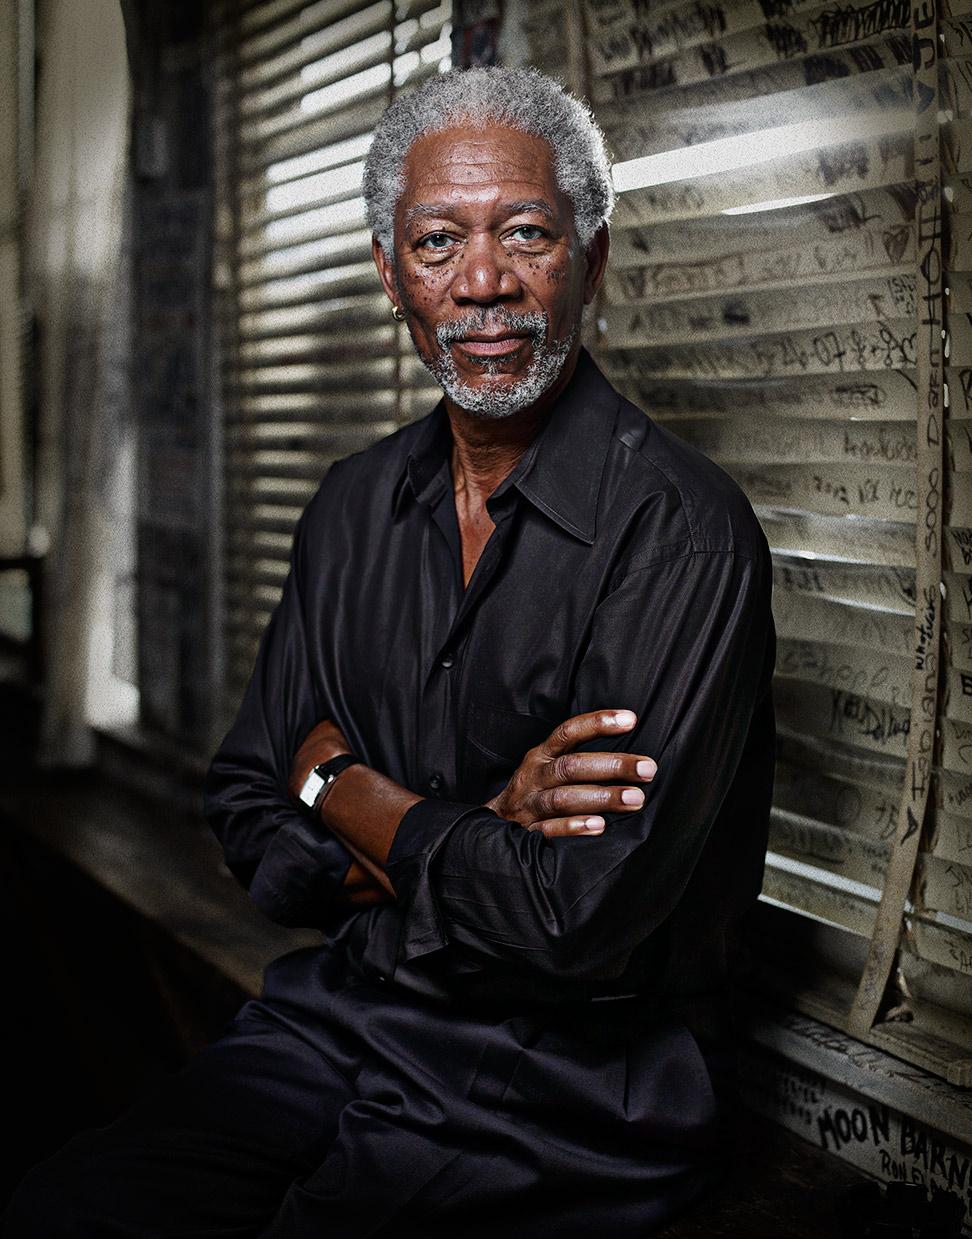 Mark DeLong - Celebrity Photographer - Morgan Freeman relaxing against a window.